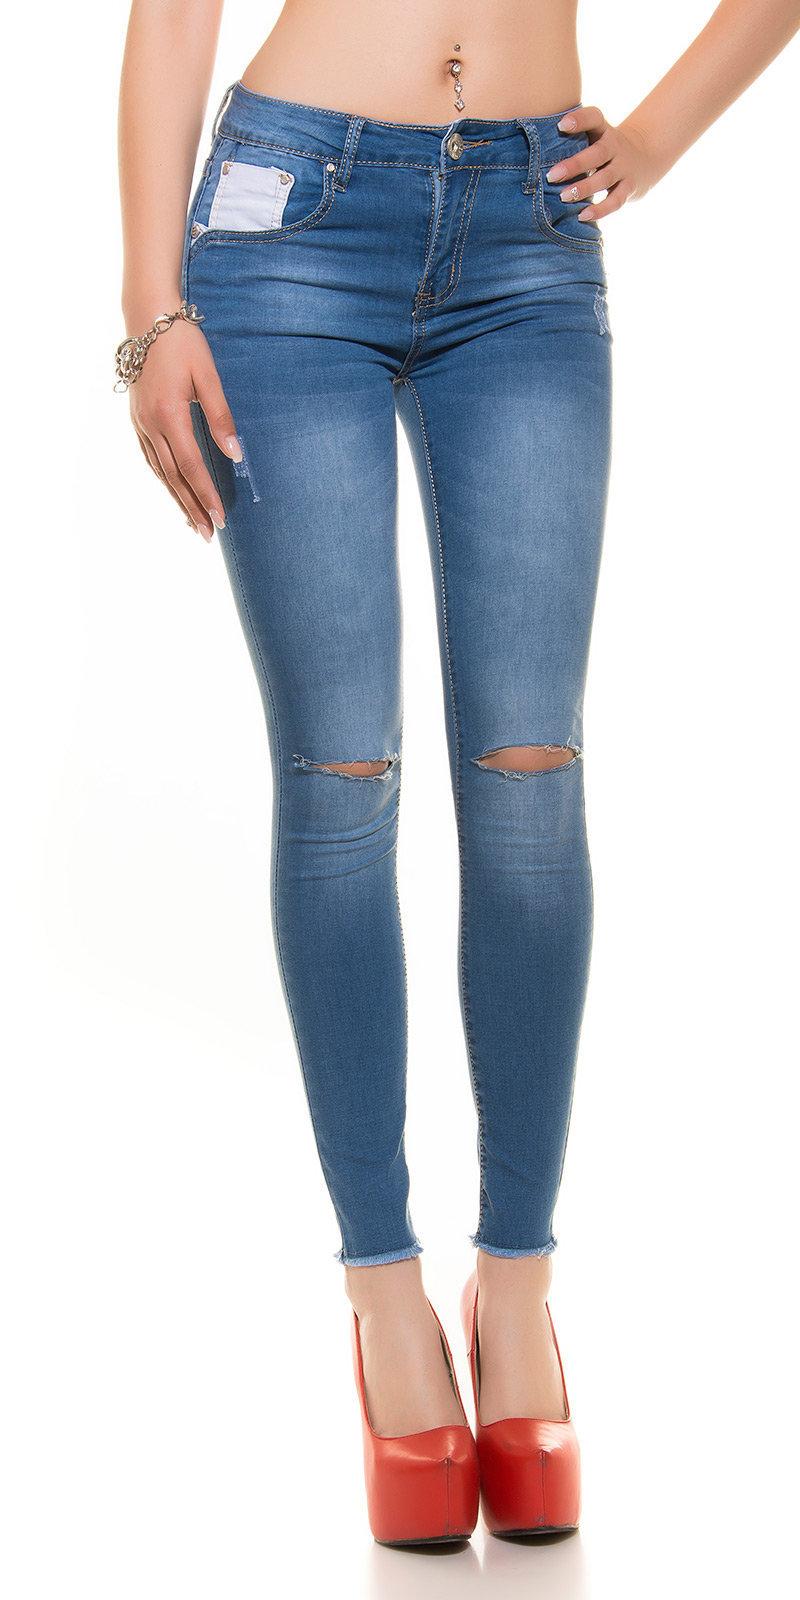 kkskinny jeans destroyed look color jeansblue size l 0000j990 jeansblau 17 de caro calzature. Black Bedroom Furniture Sets. Home Design Ideas